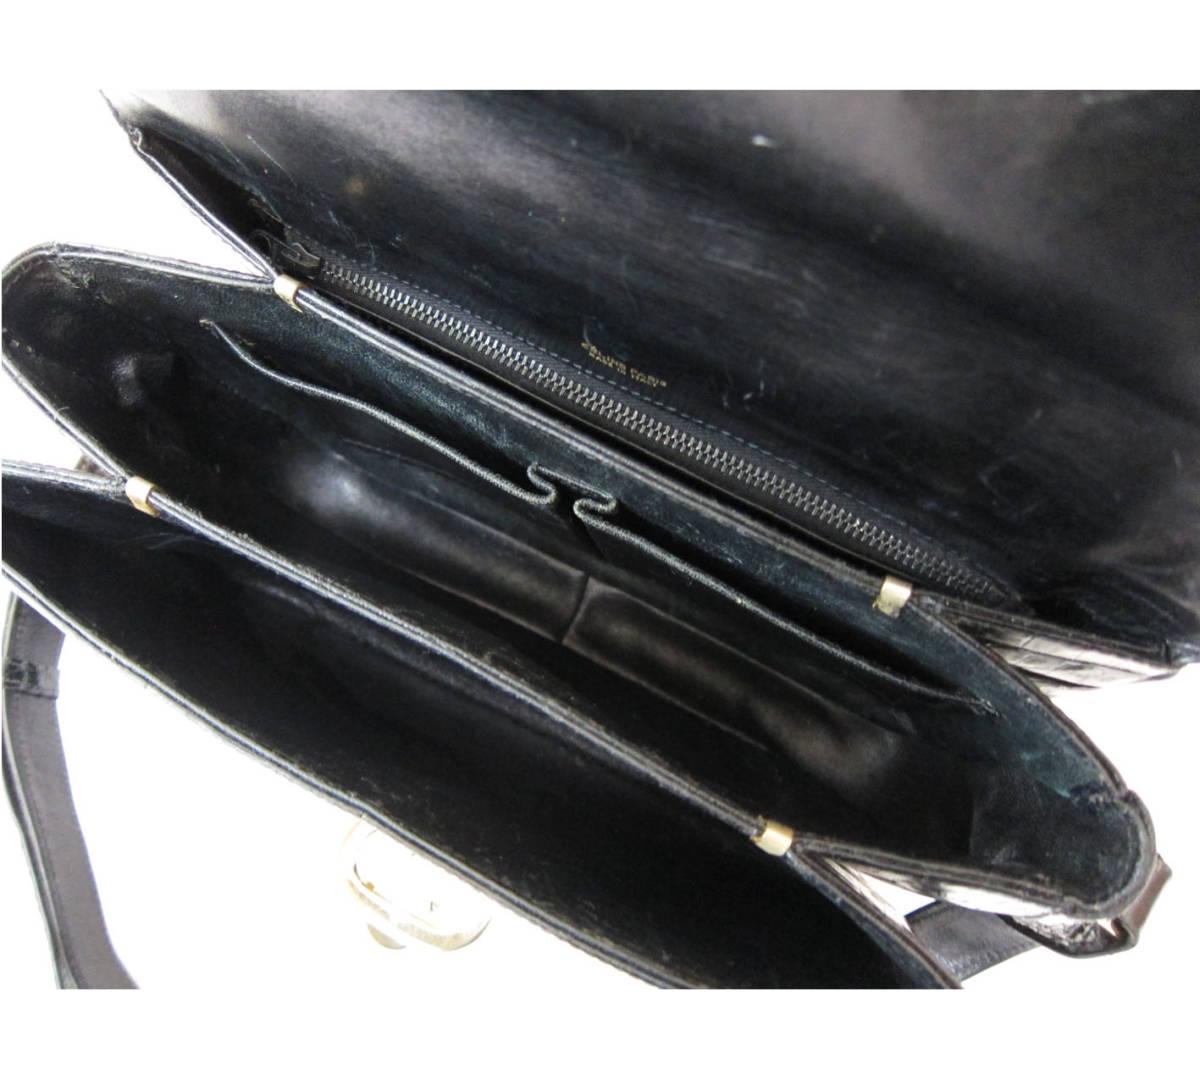 5b98afc6172b 美品 CELINE セリーヌ 馬車金具 本ワニ革 クロコダイル レザー ショルダーバッグ ハンドバッグ 極希少